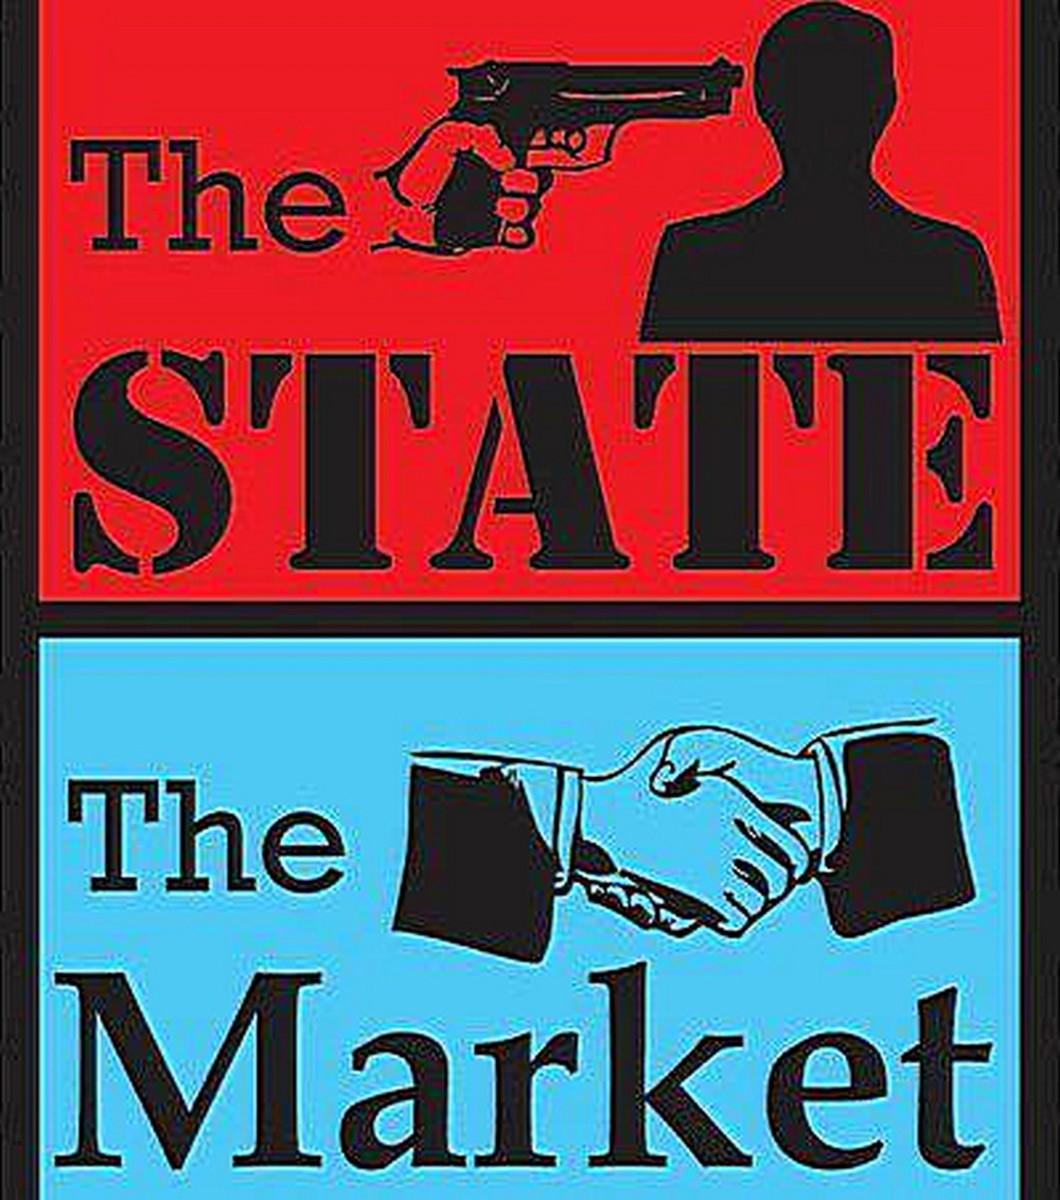 Coercion vs. Voluntaryism: Capitalism plus the state equals Corporatism; Capitalism minus the state equals Free Markets.